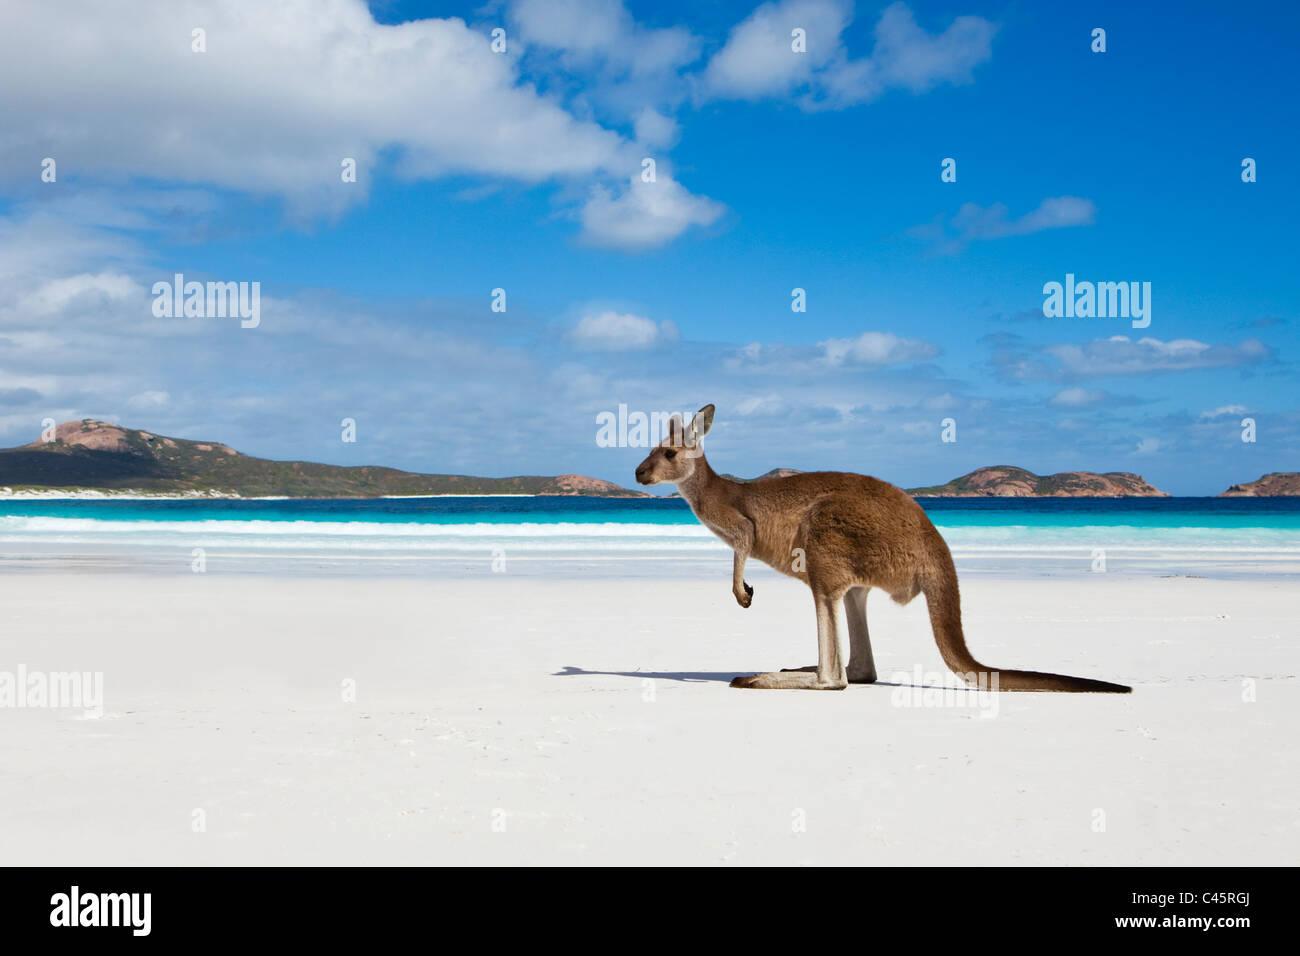 Método canguru na praia na Baía de sorte. Cape Le Grand National Park, Esperance, Western Australia, Austrália Imagens de Stock